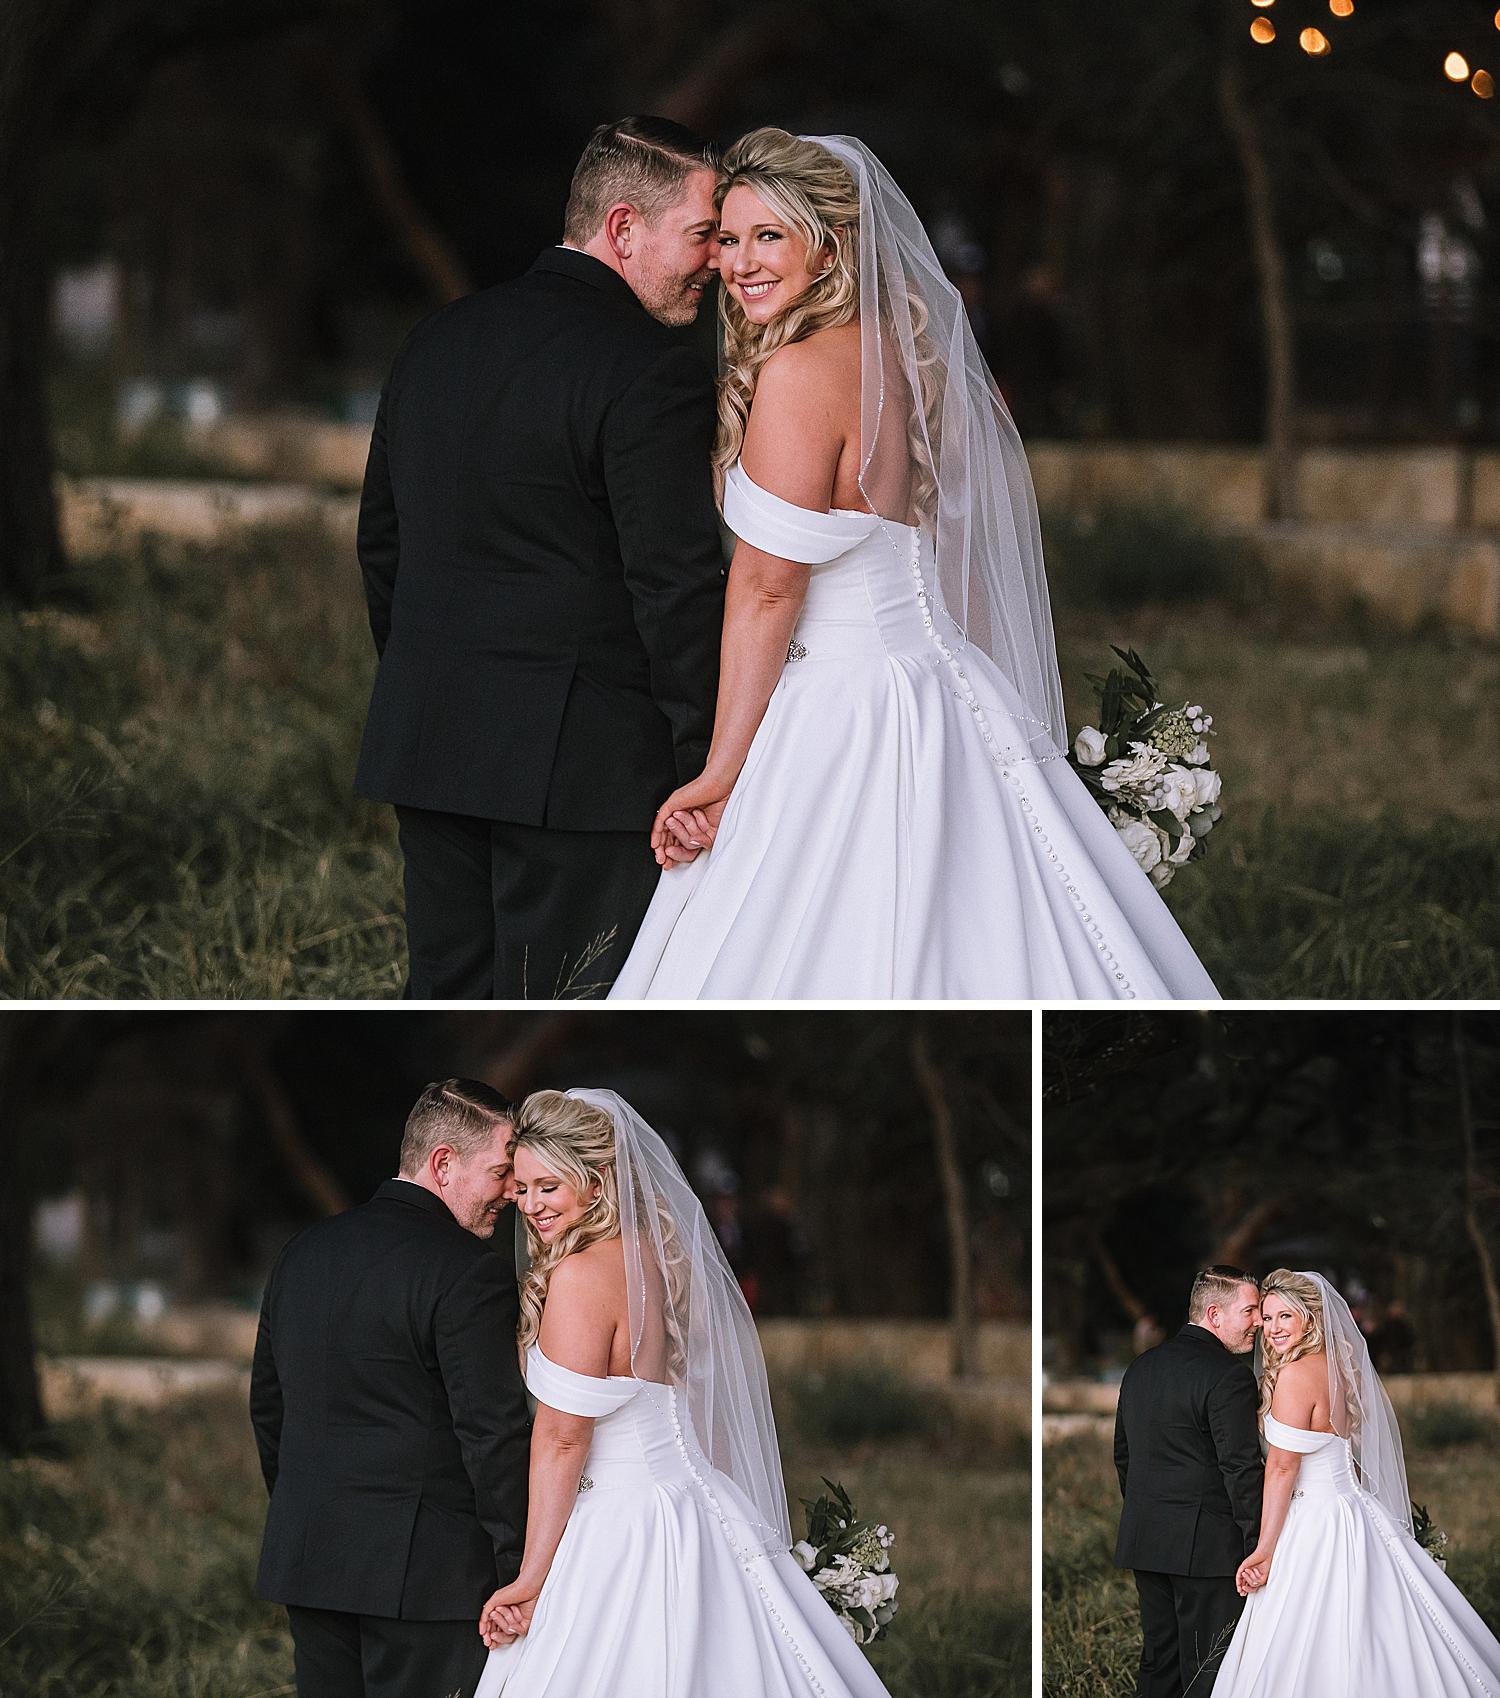 Magnolia-Halle-Wedding-San-Antonio-Texas-Bride-Grom_0068.jpg